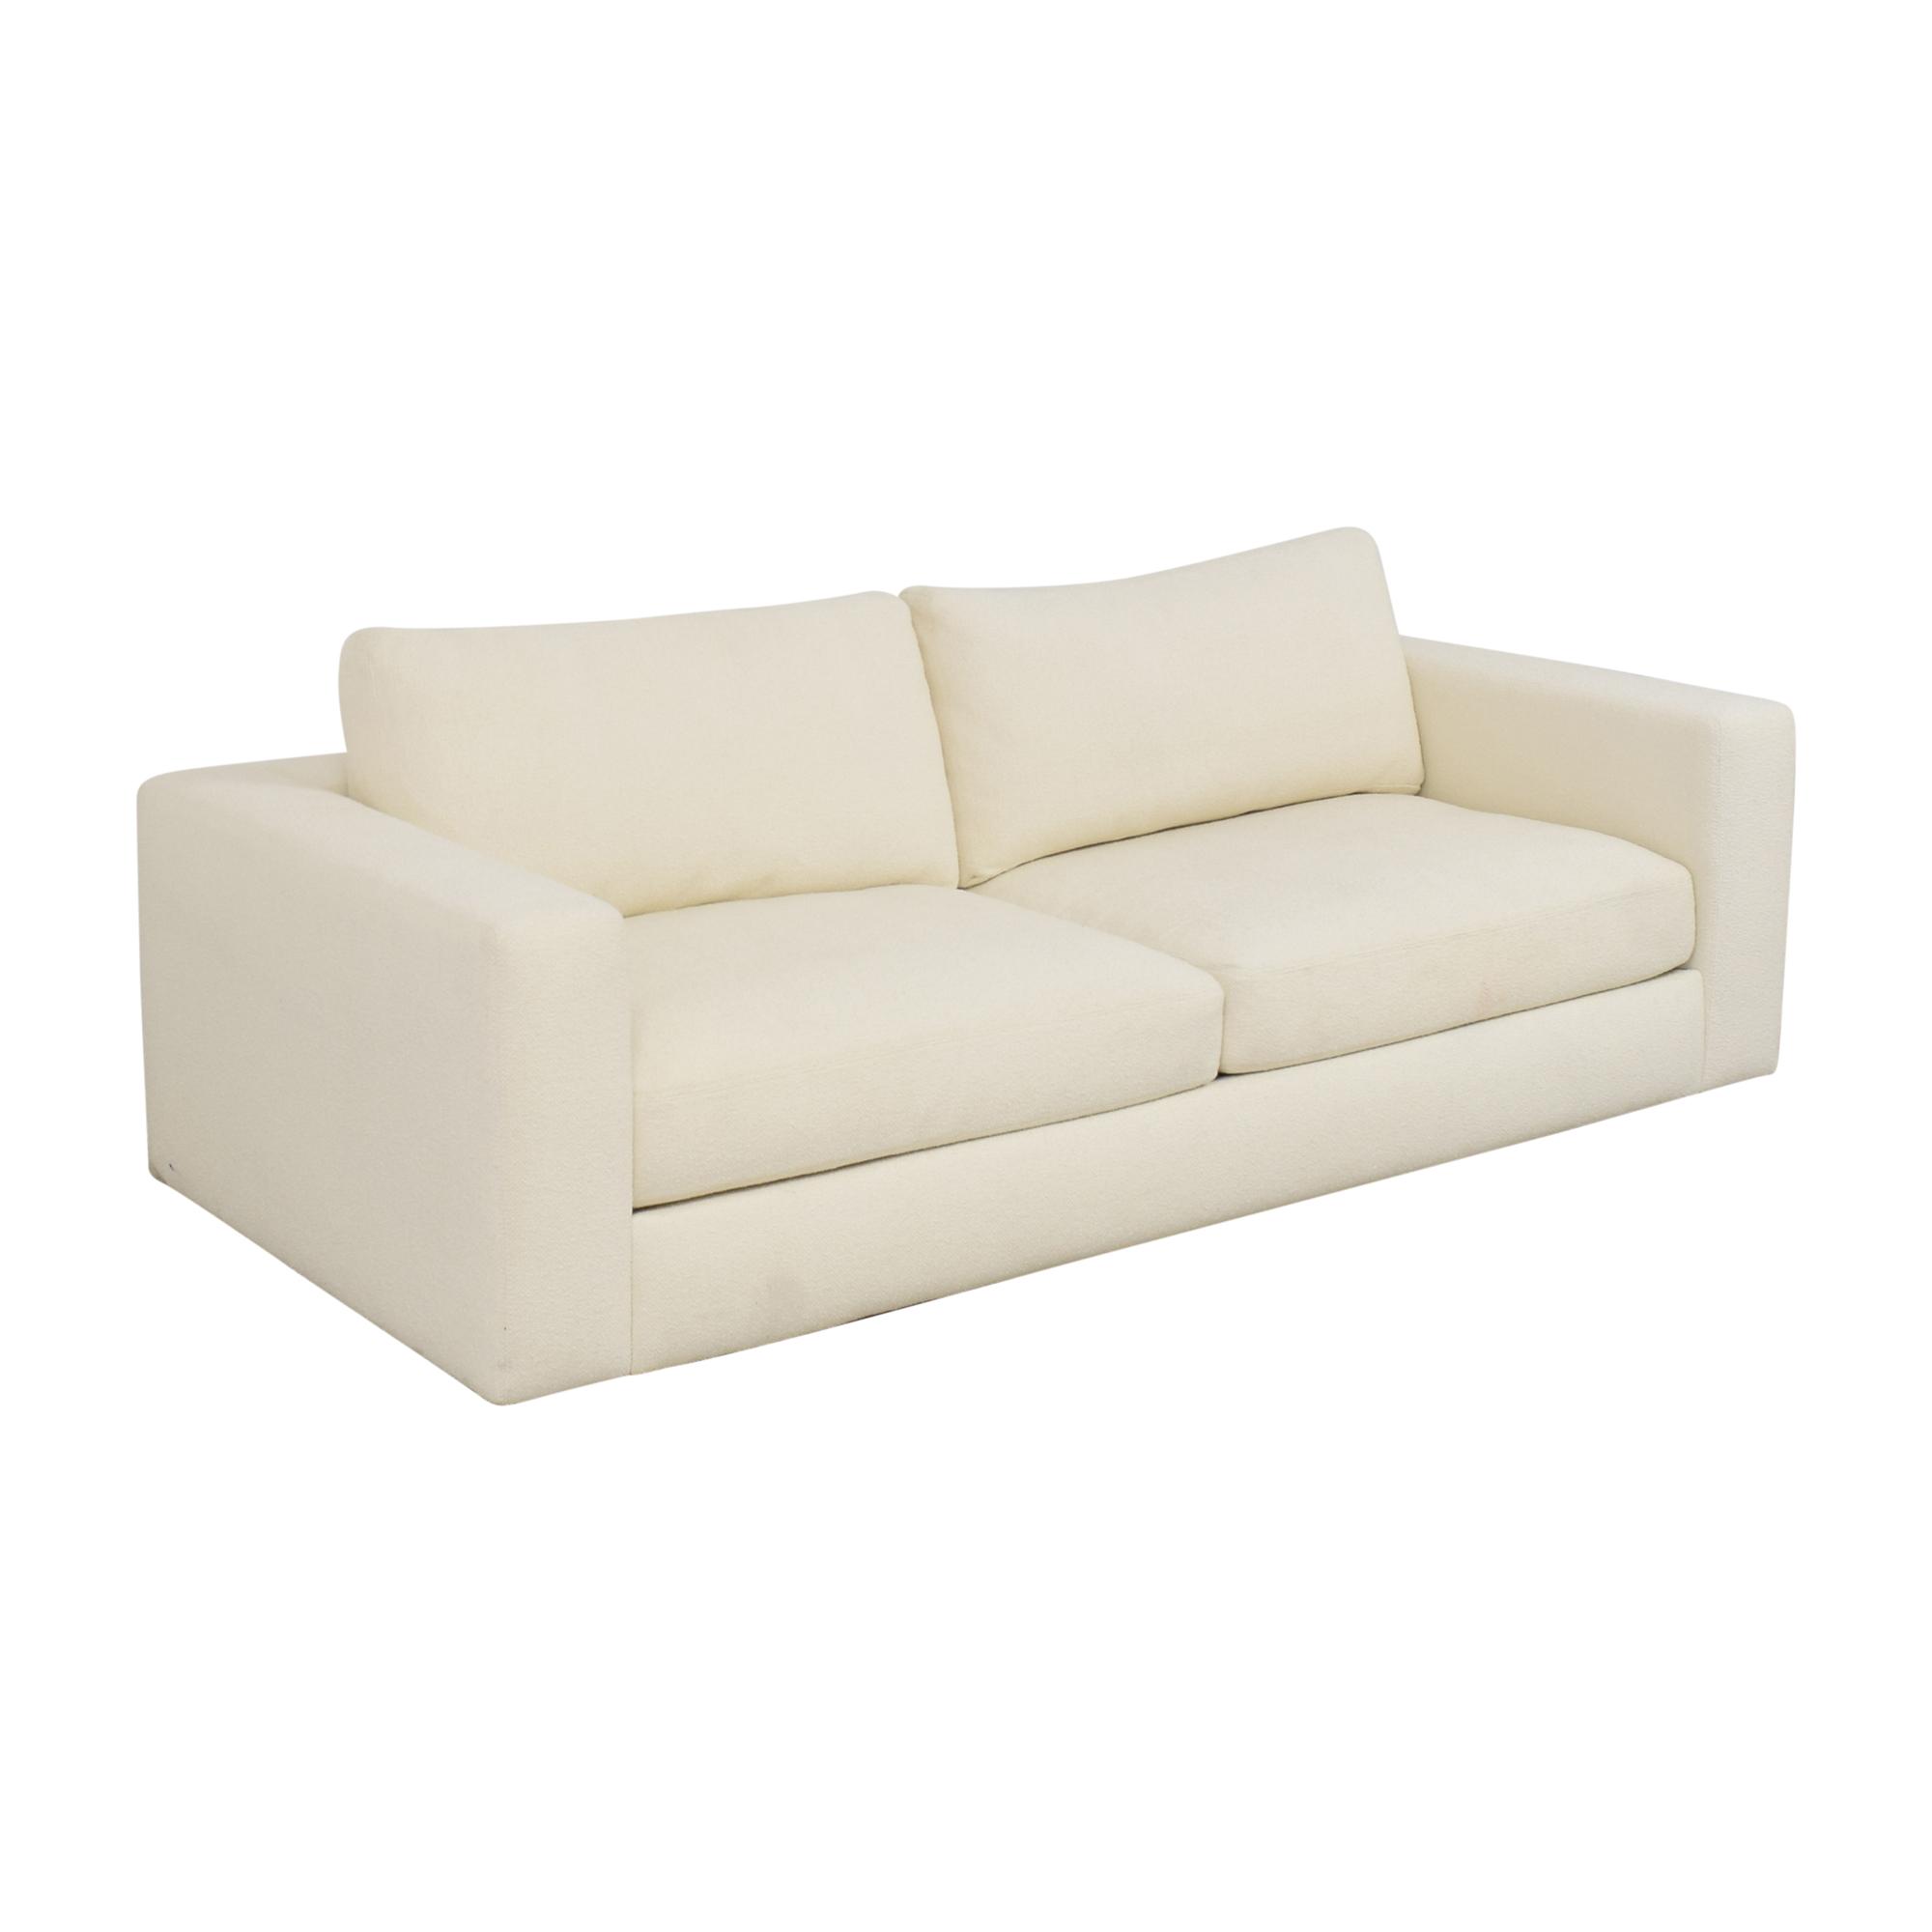 buy Design Within Reach Reid Sofa Design Within Reach Classic Sofas